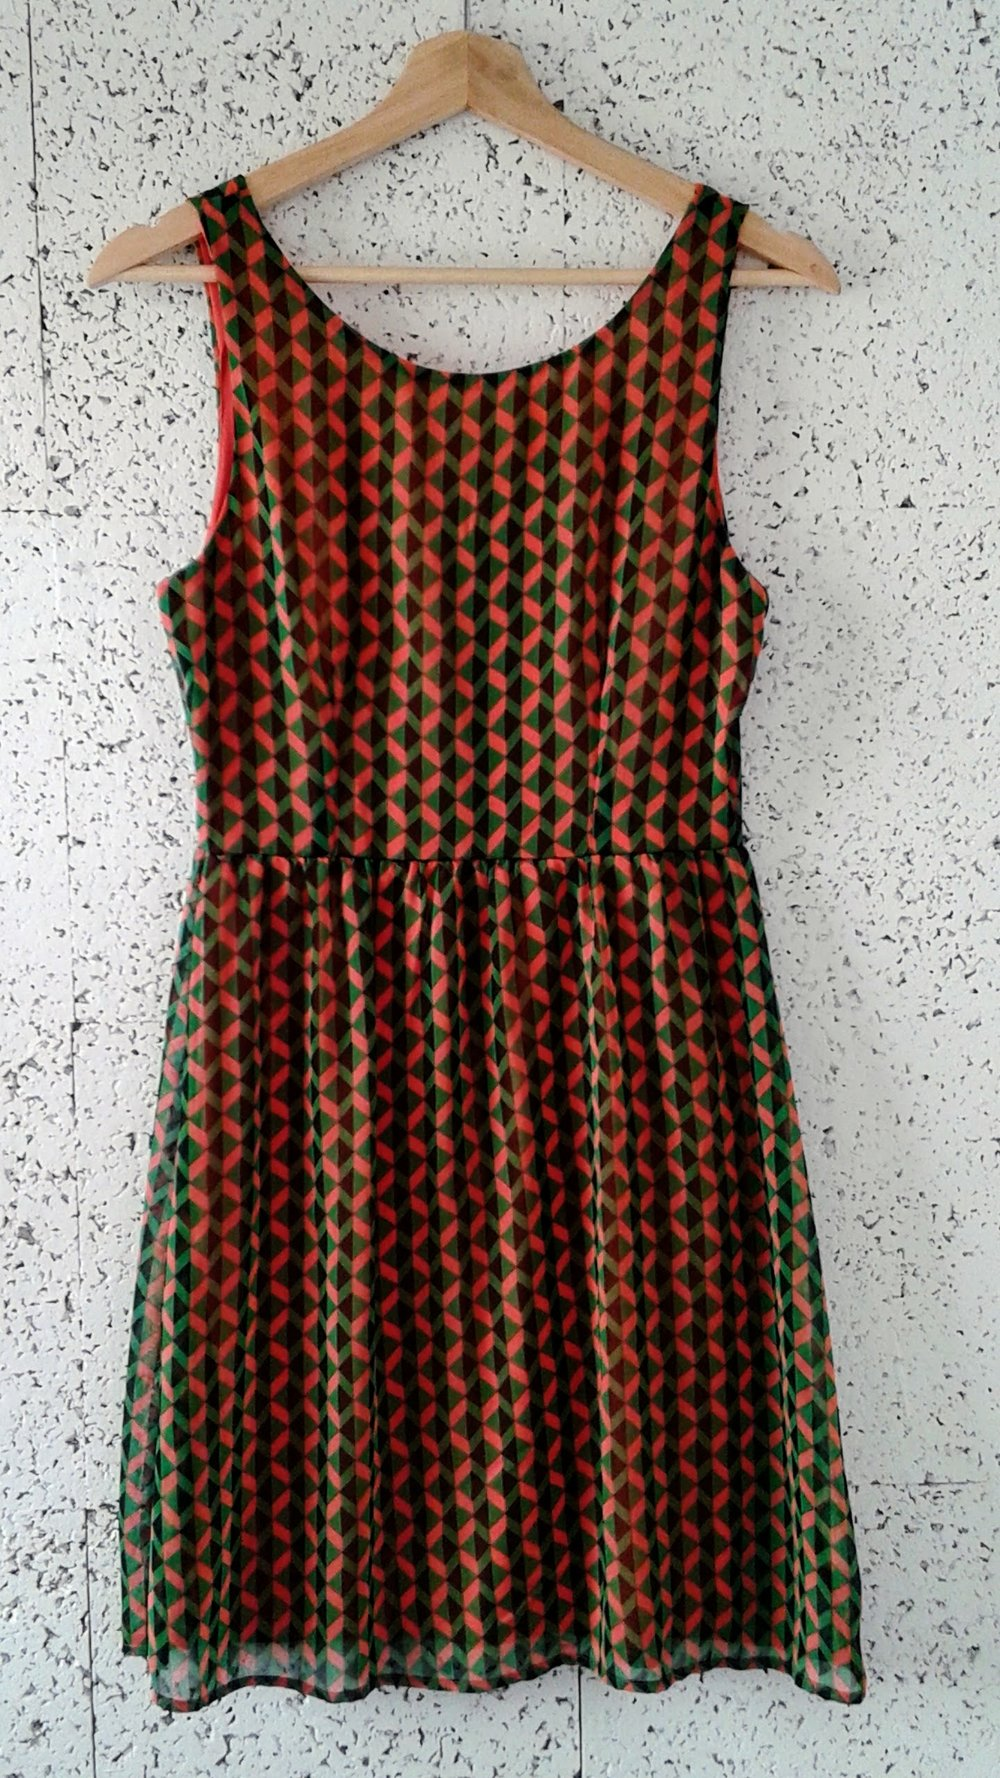 Cocolove  dress; Size S, $26